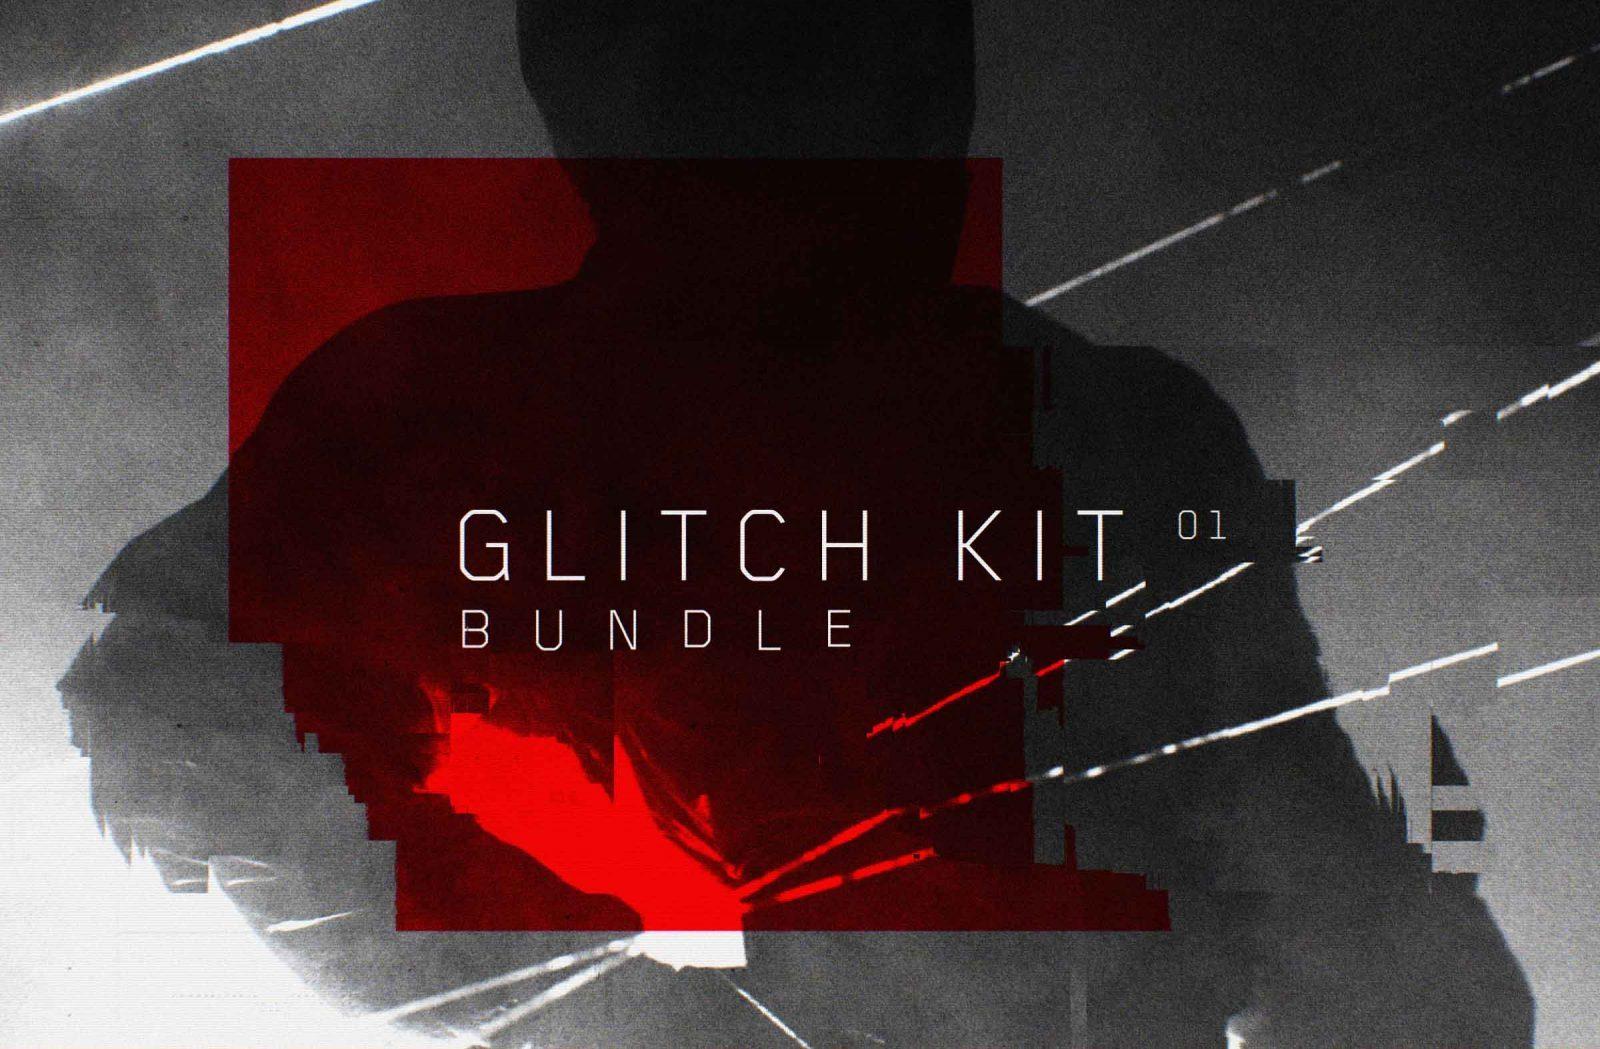 GLITCH KIT 01 : BUNDLE from helloluxx